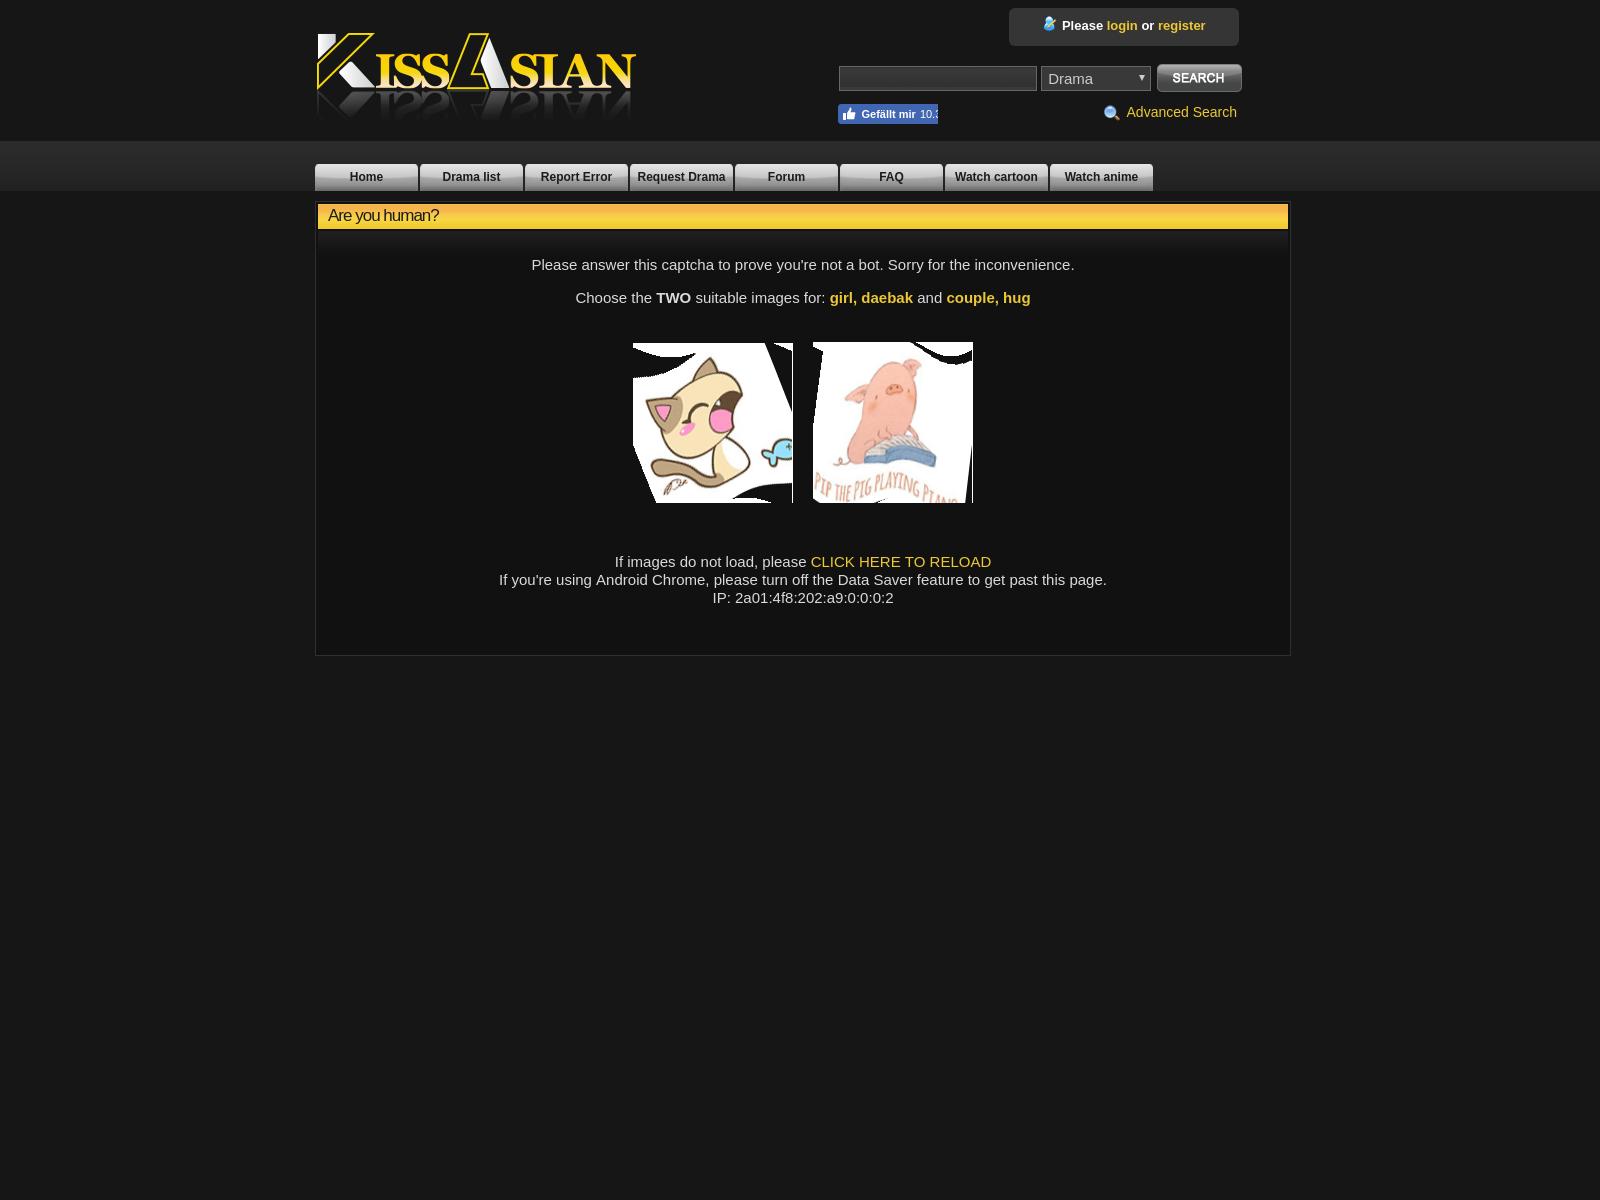 kissasian sh - urlscan io